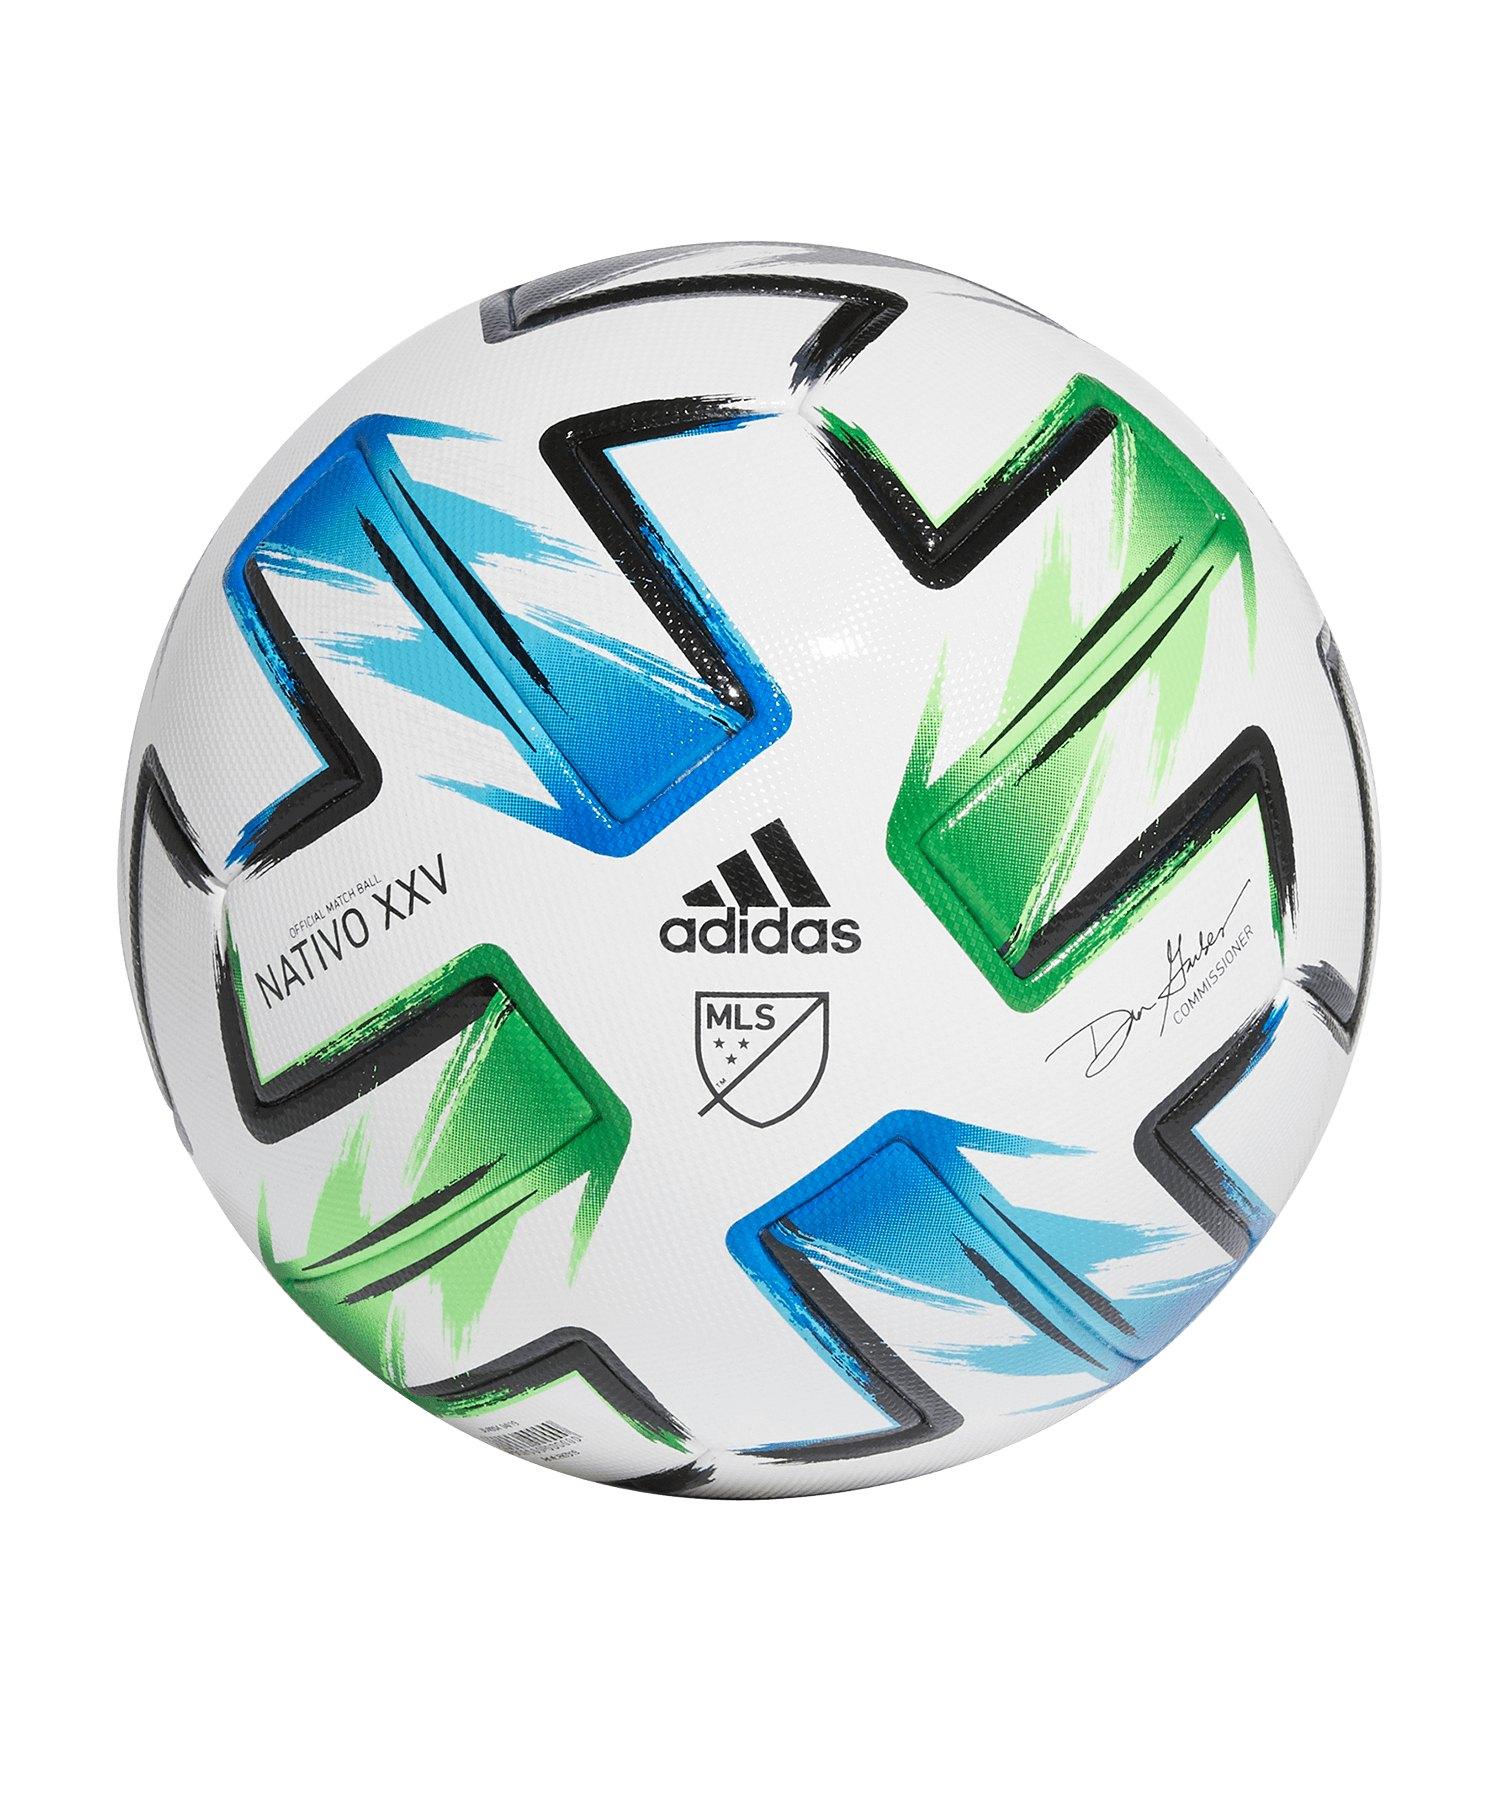 adidas MLS Pro OMB Spielball Weiss Blau Grün - weiss